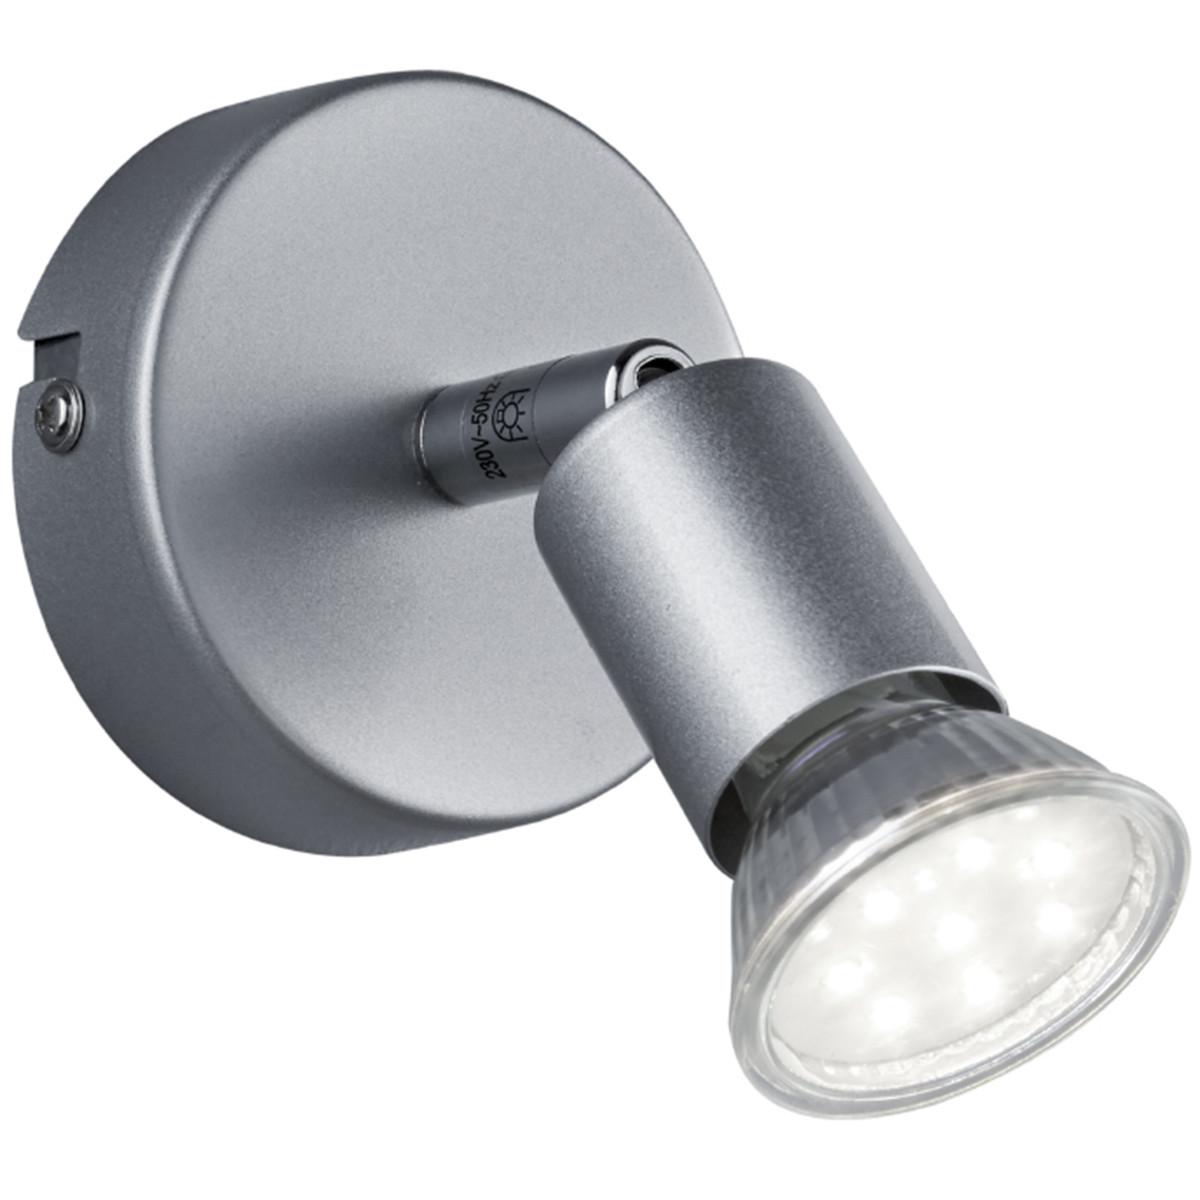 LED Plafondspot - Trion Pamo - GU10 Fitting - 3W - Warm Wit 3000K - 1-lichts - Rond - Mat Titaan - A